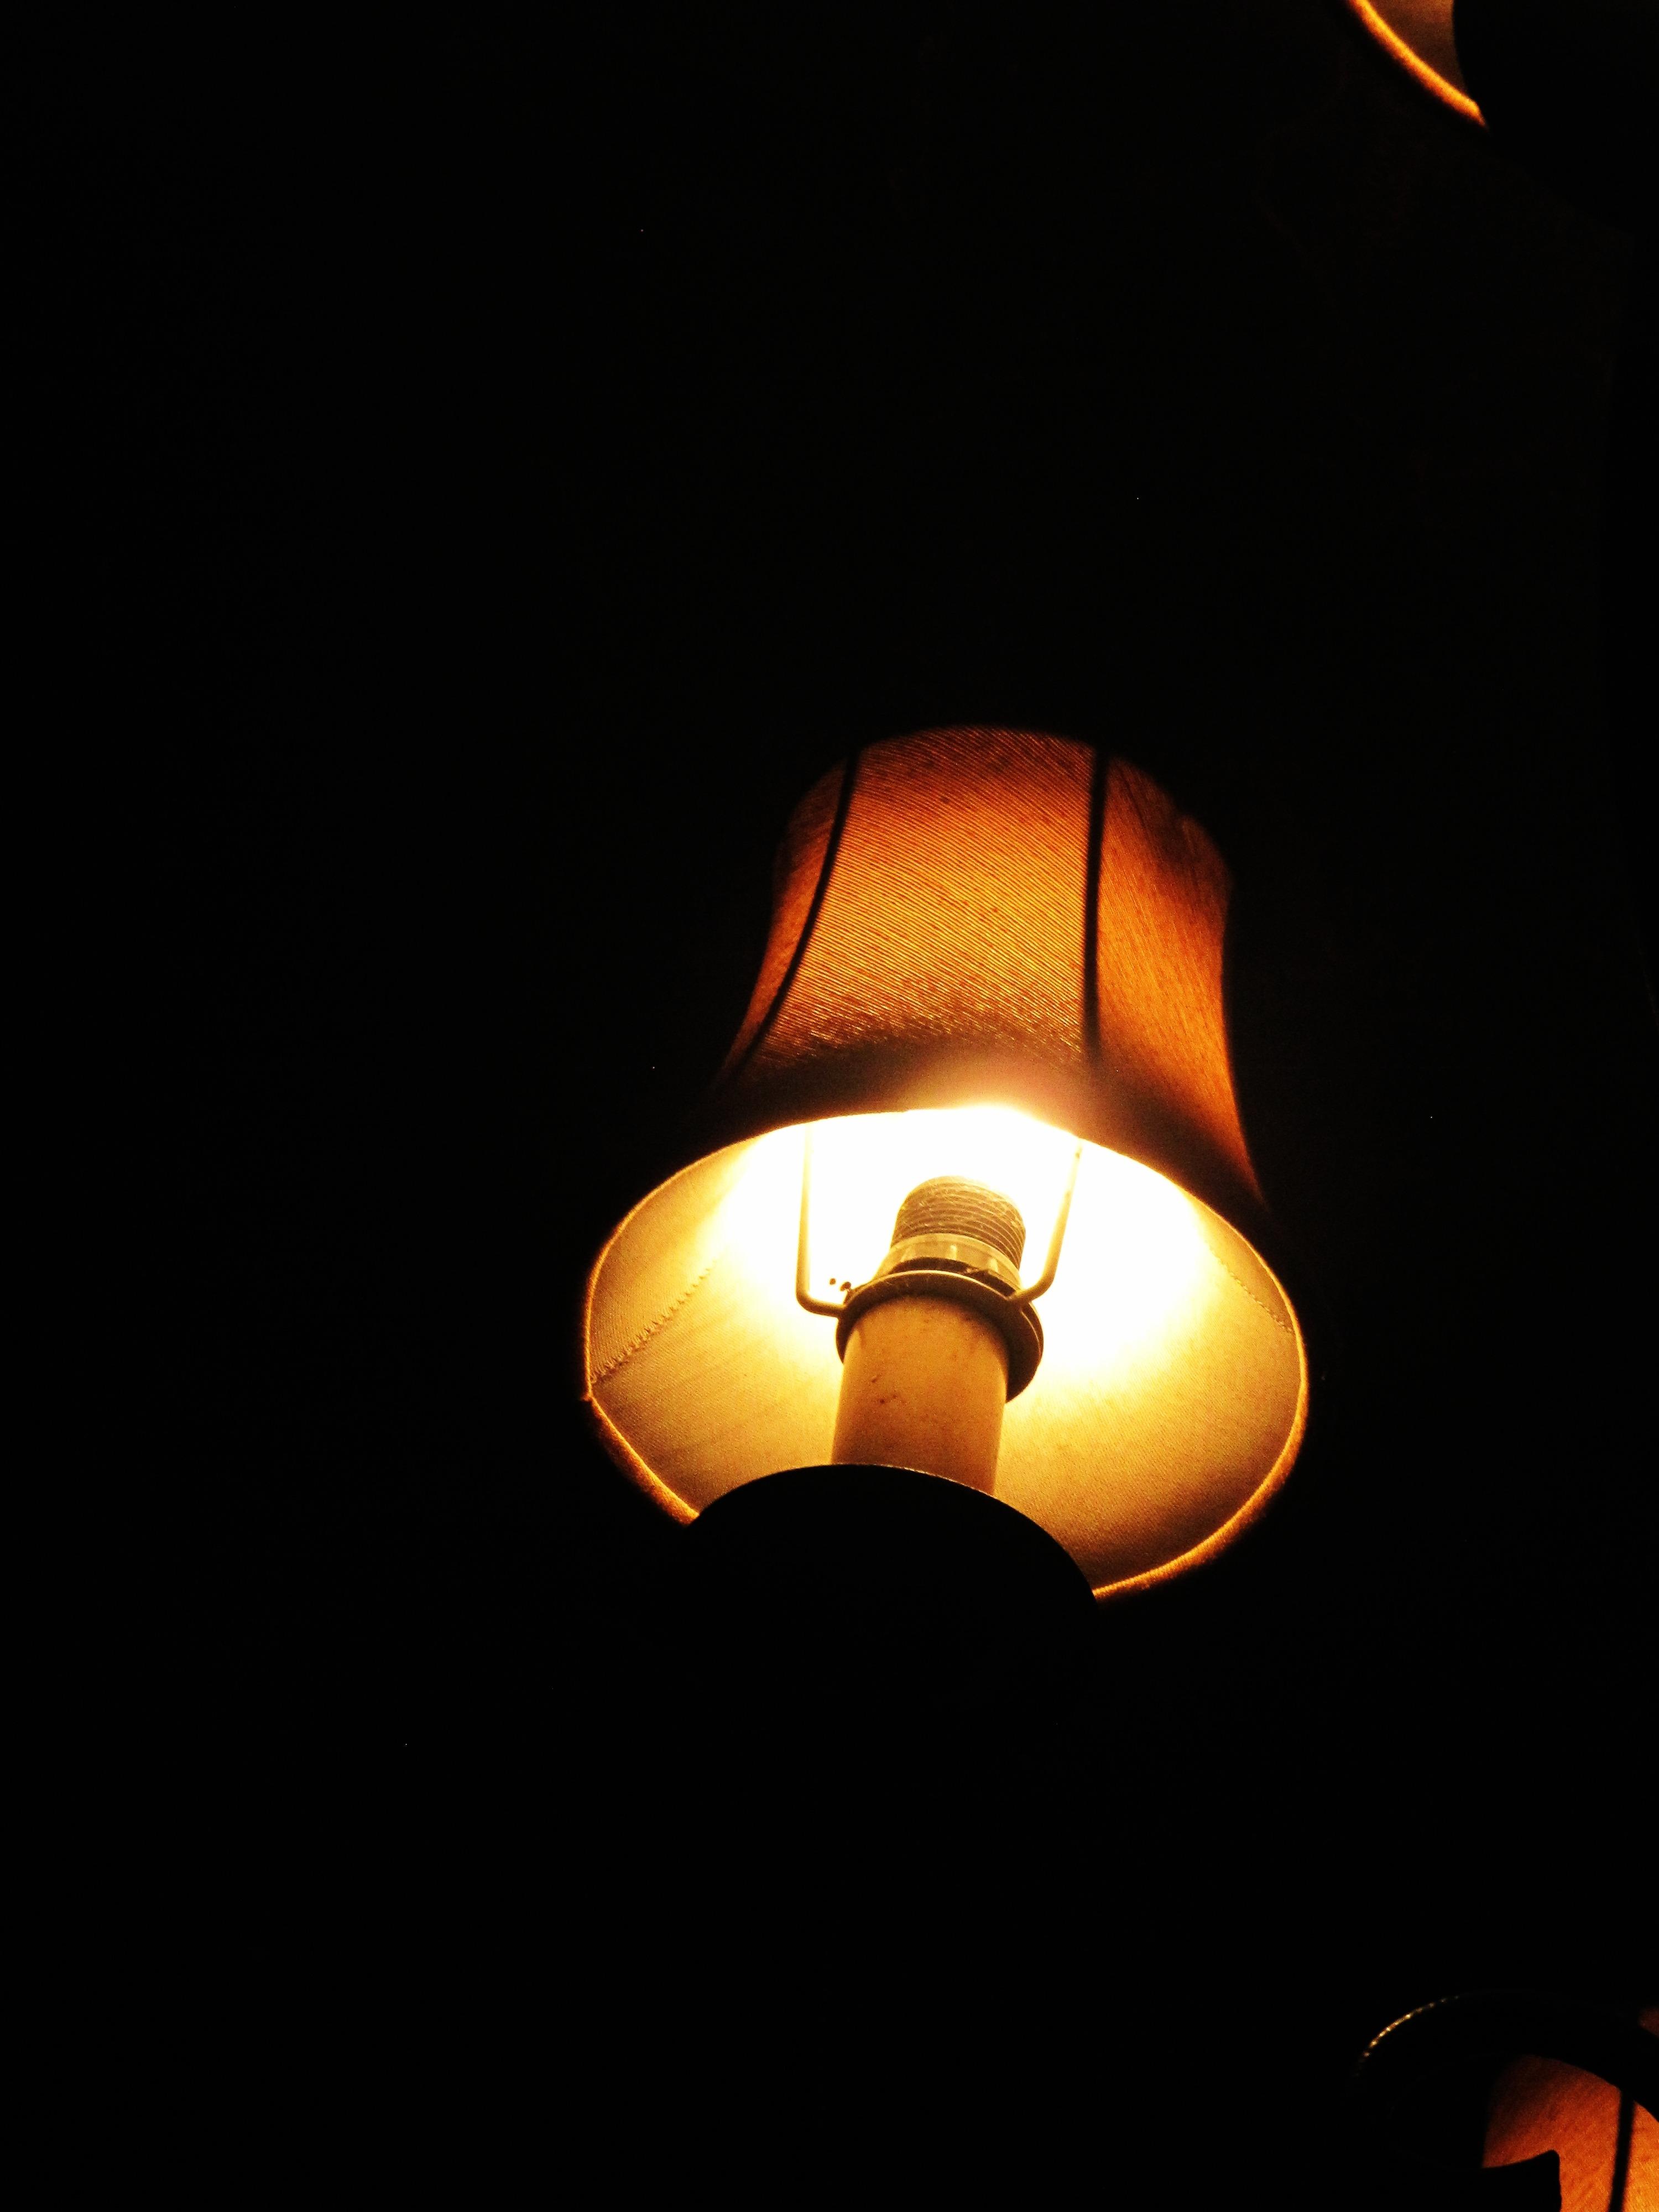 light shining dark darkness bulb lamp yellow bright glowing circle glow night lighting energy fixture flame illumination shine incandescent illuminated